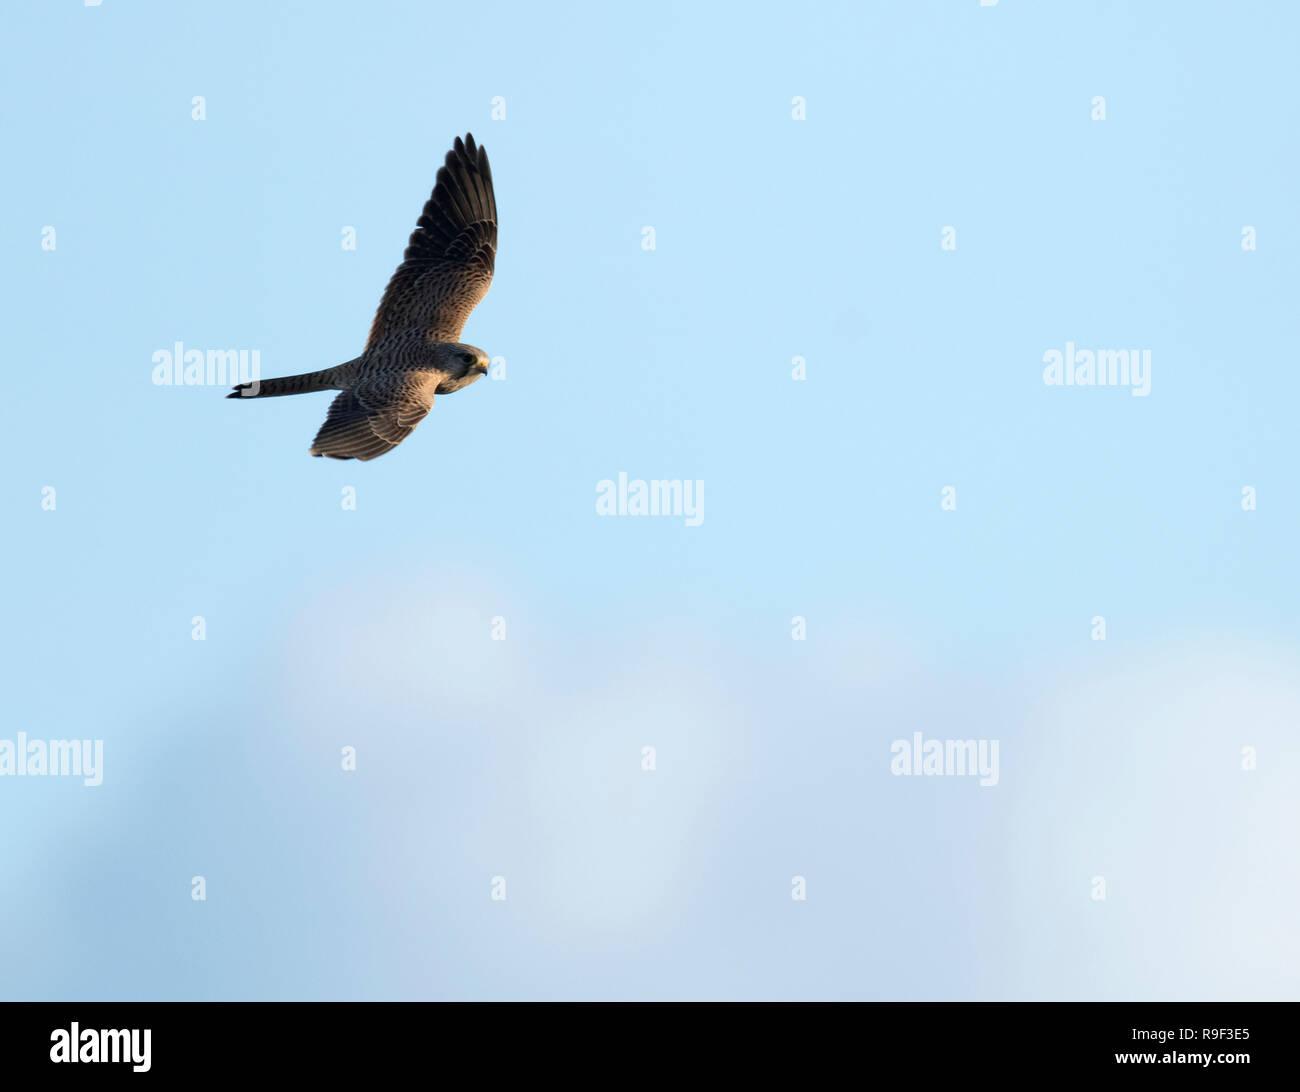 A wild female Kestrel (Falco tinnunculus) in flight against a blue sky, Gloucestershire - Stock Image